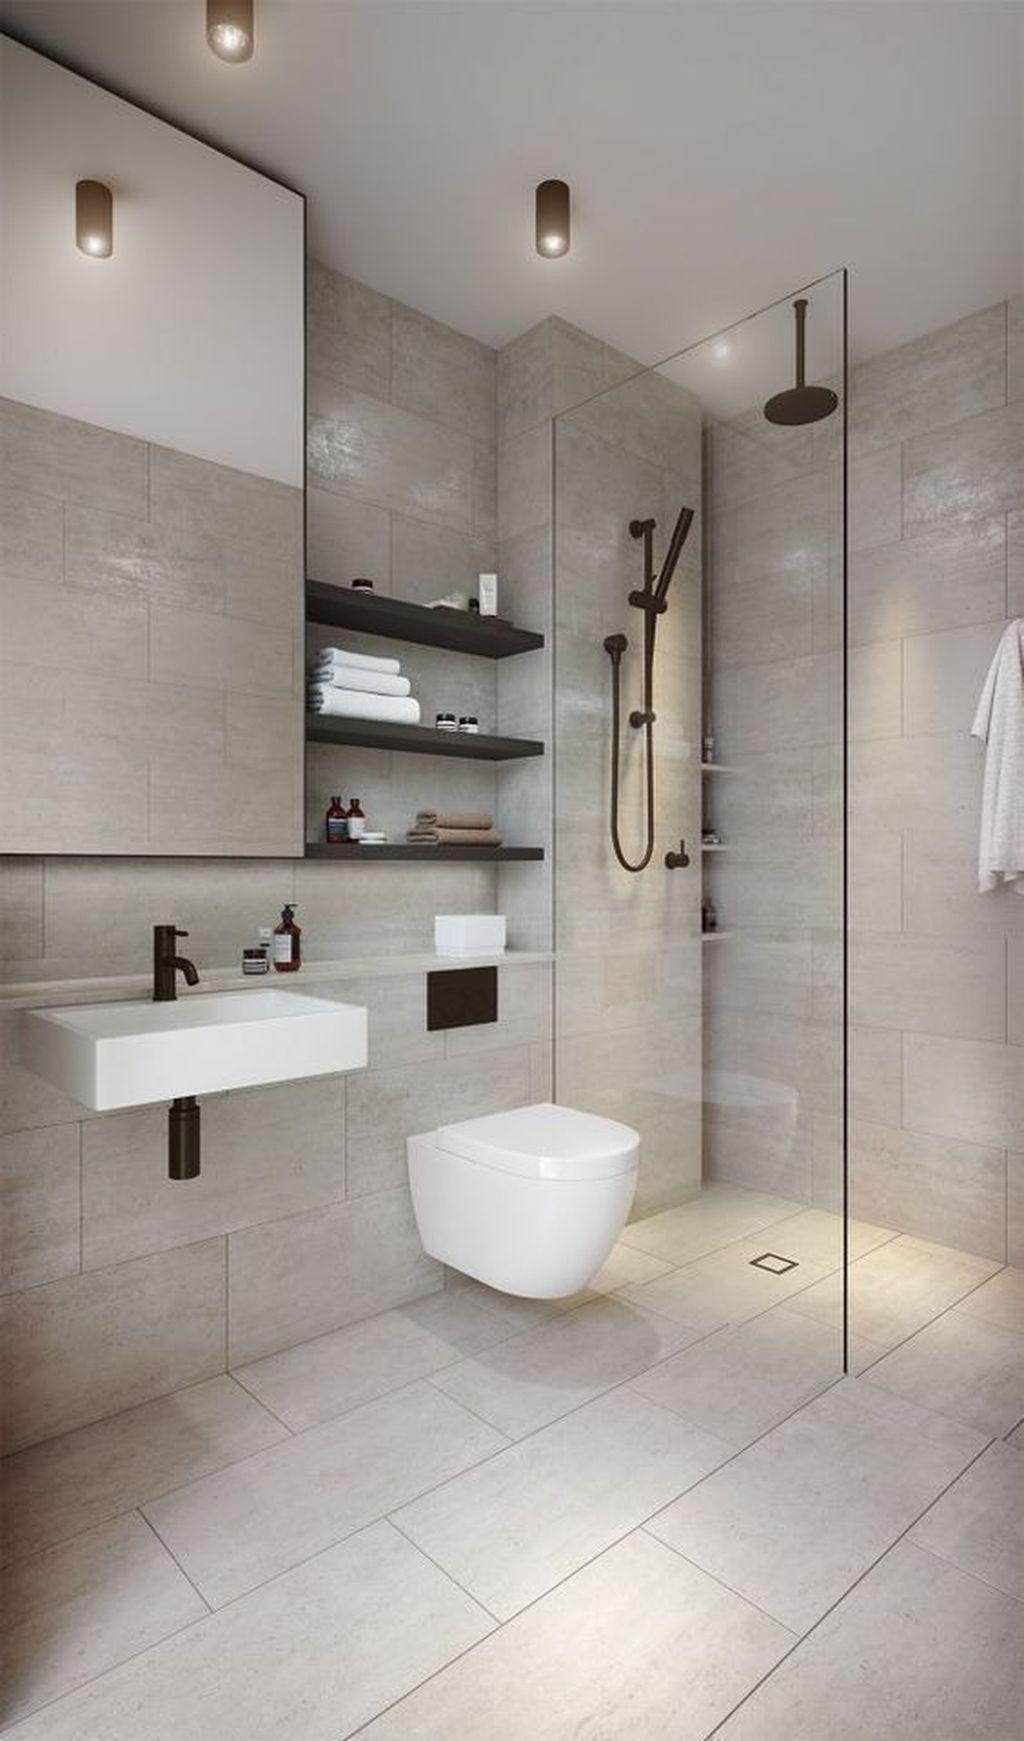 Unusual Bathroom Design Ideas You Need To Know 30